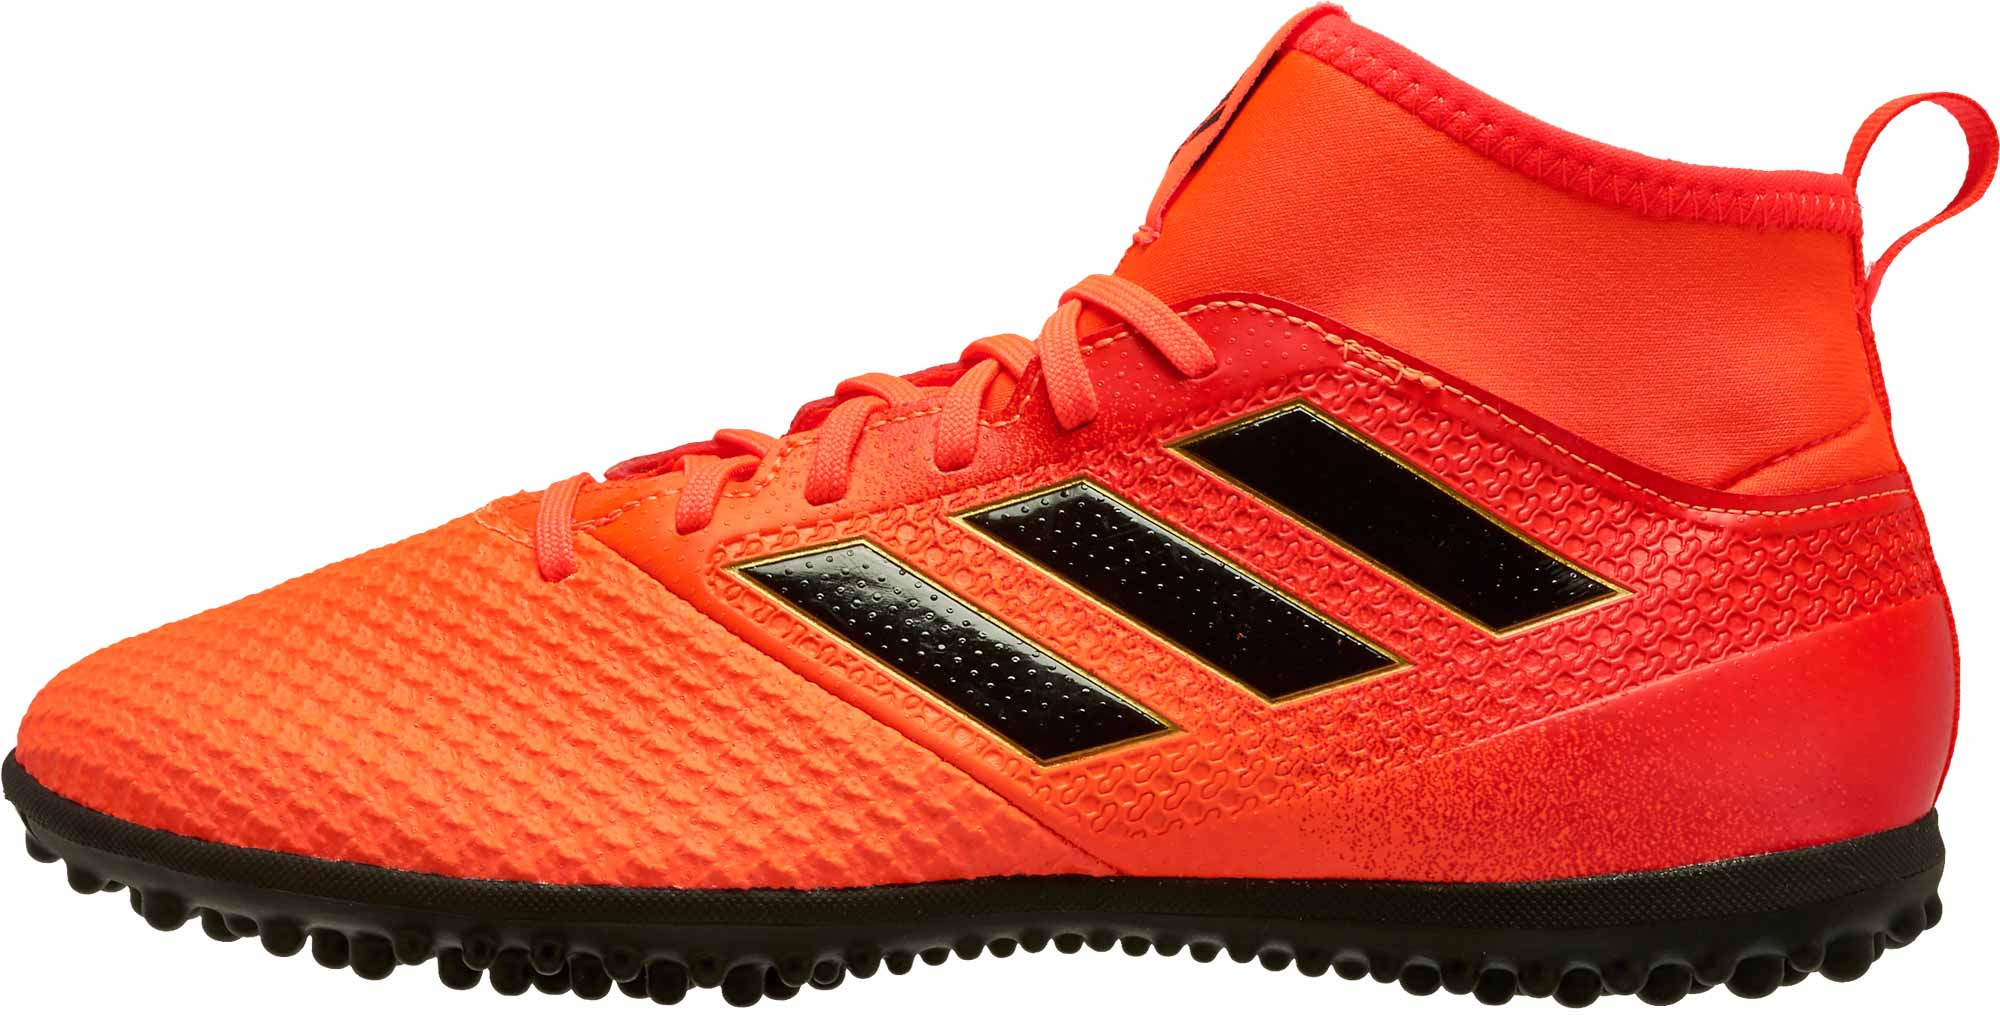 best website 91530 230e7 adidas ACE Tango 17.3 TF - Solar Red & Solar Orange